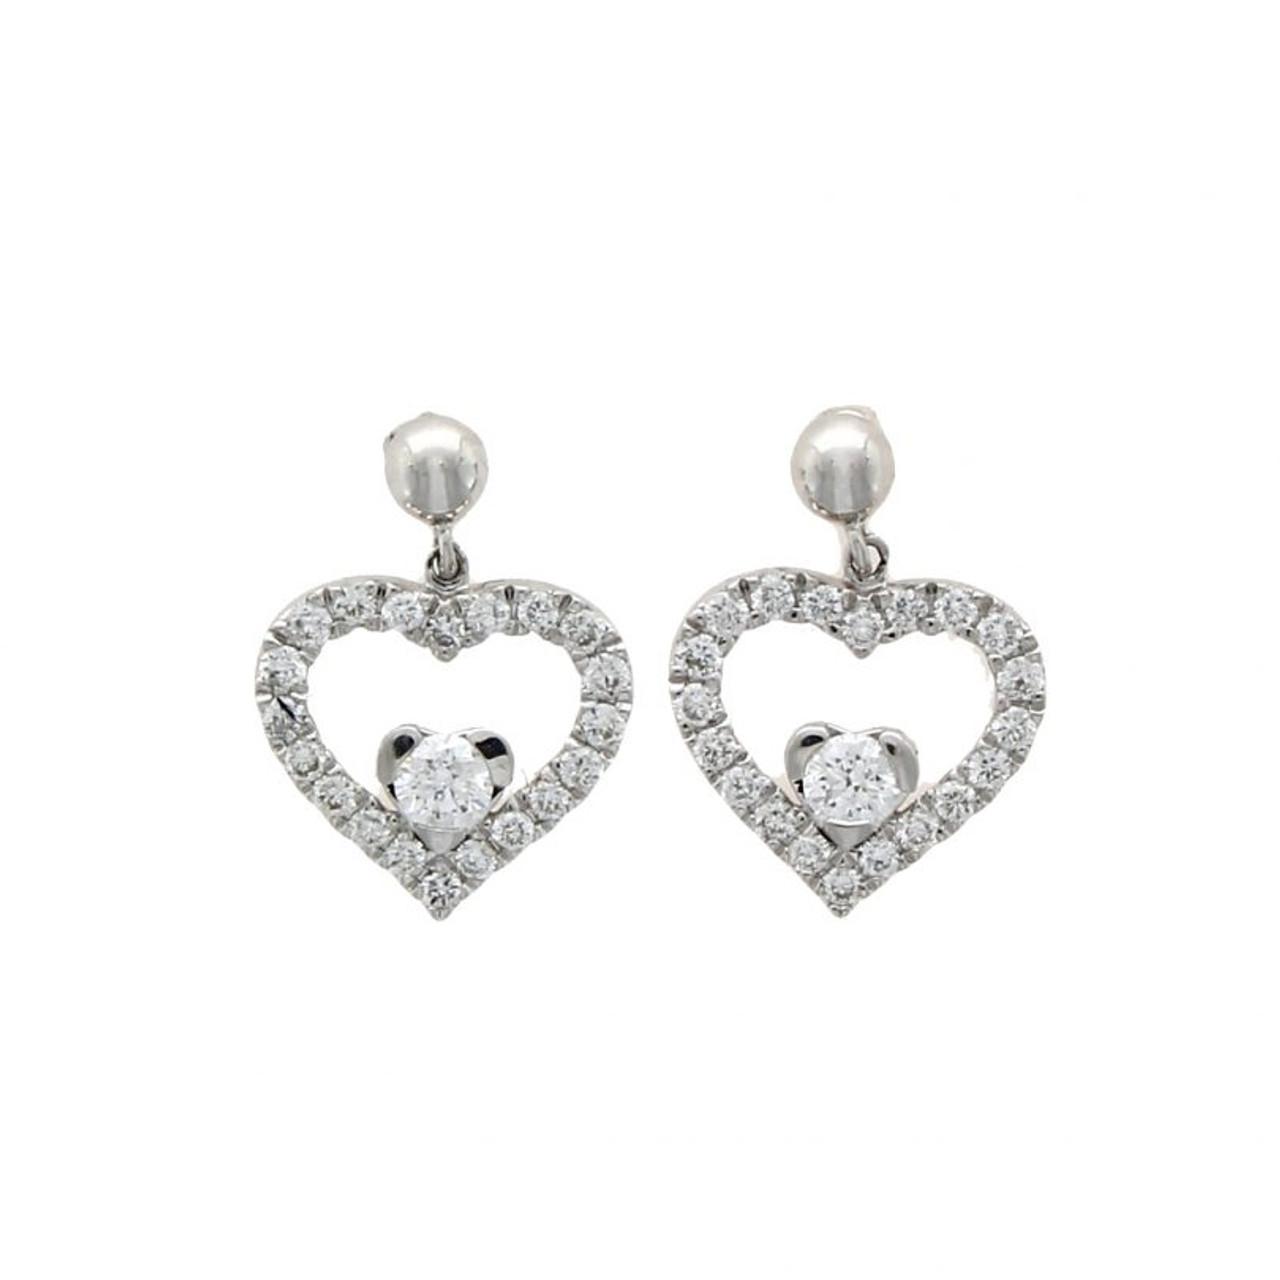 18ct White Gold Diamond Heart Drop Earrings Gatwards Of Hitchin